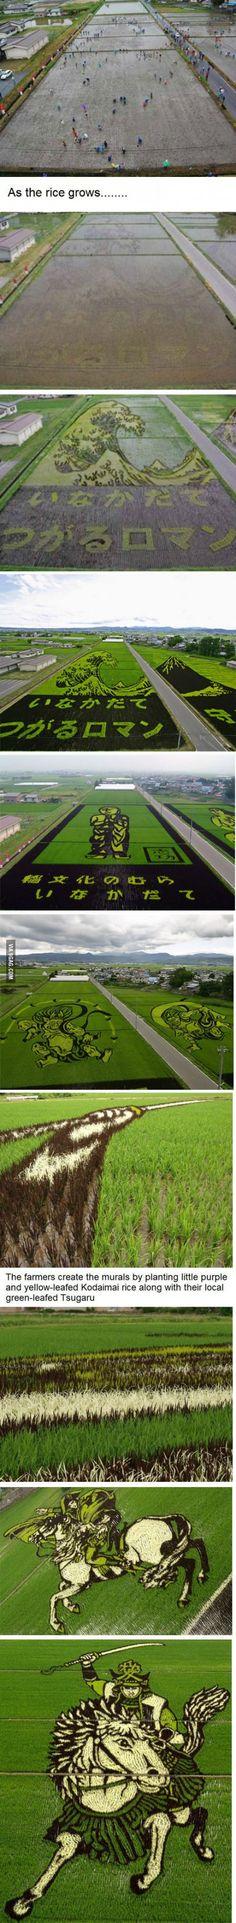 Farmers created murals by planting purple- and yellow-leafed Kodaimai rice alongside local green-leafed Tsugaru rice